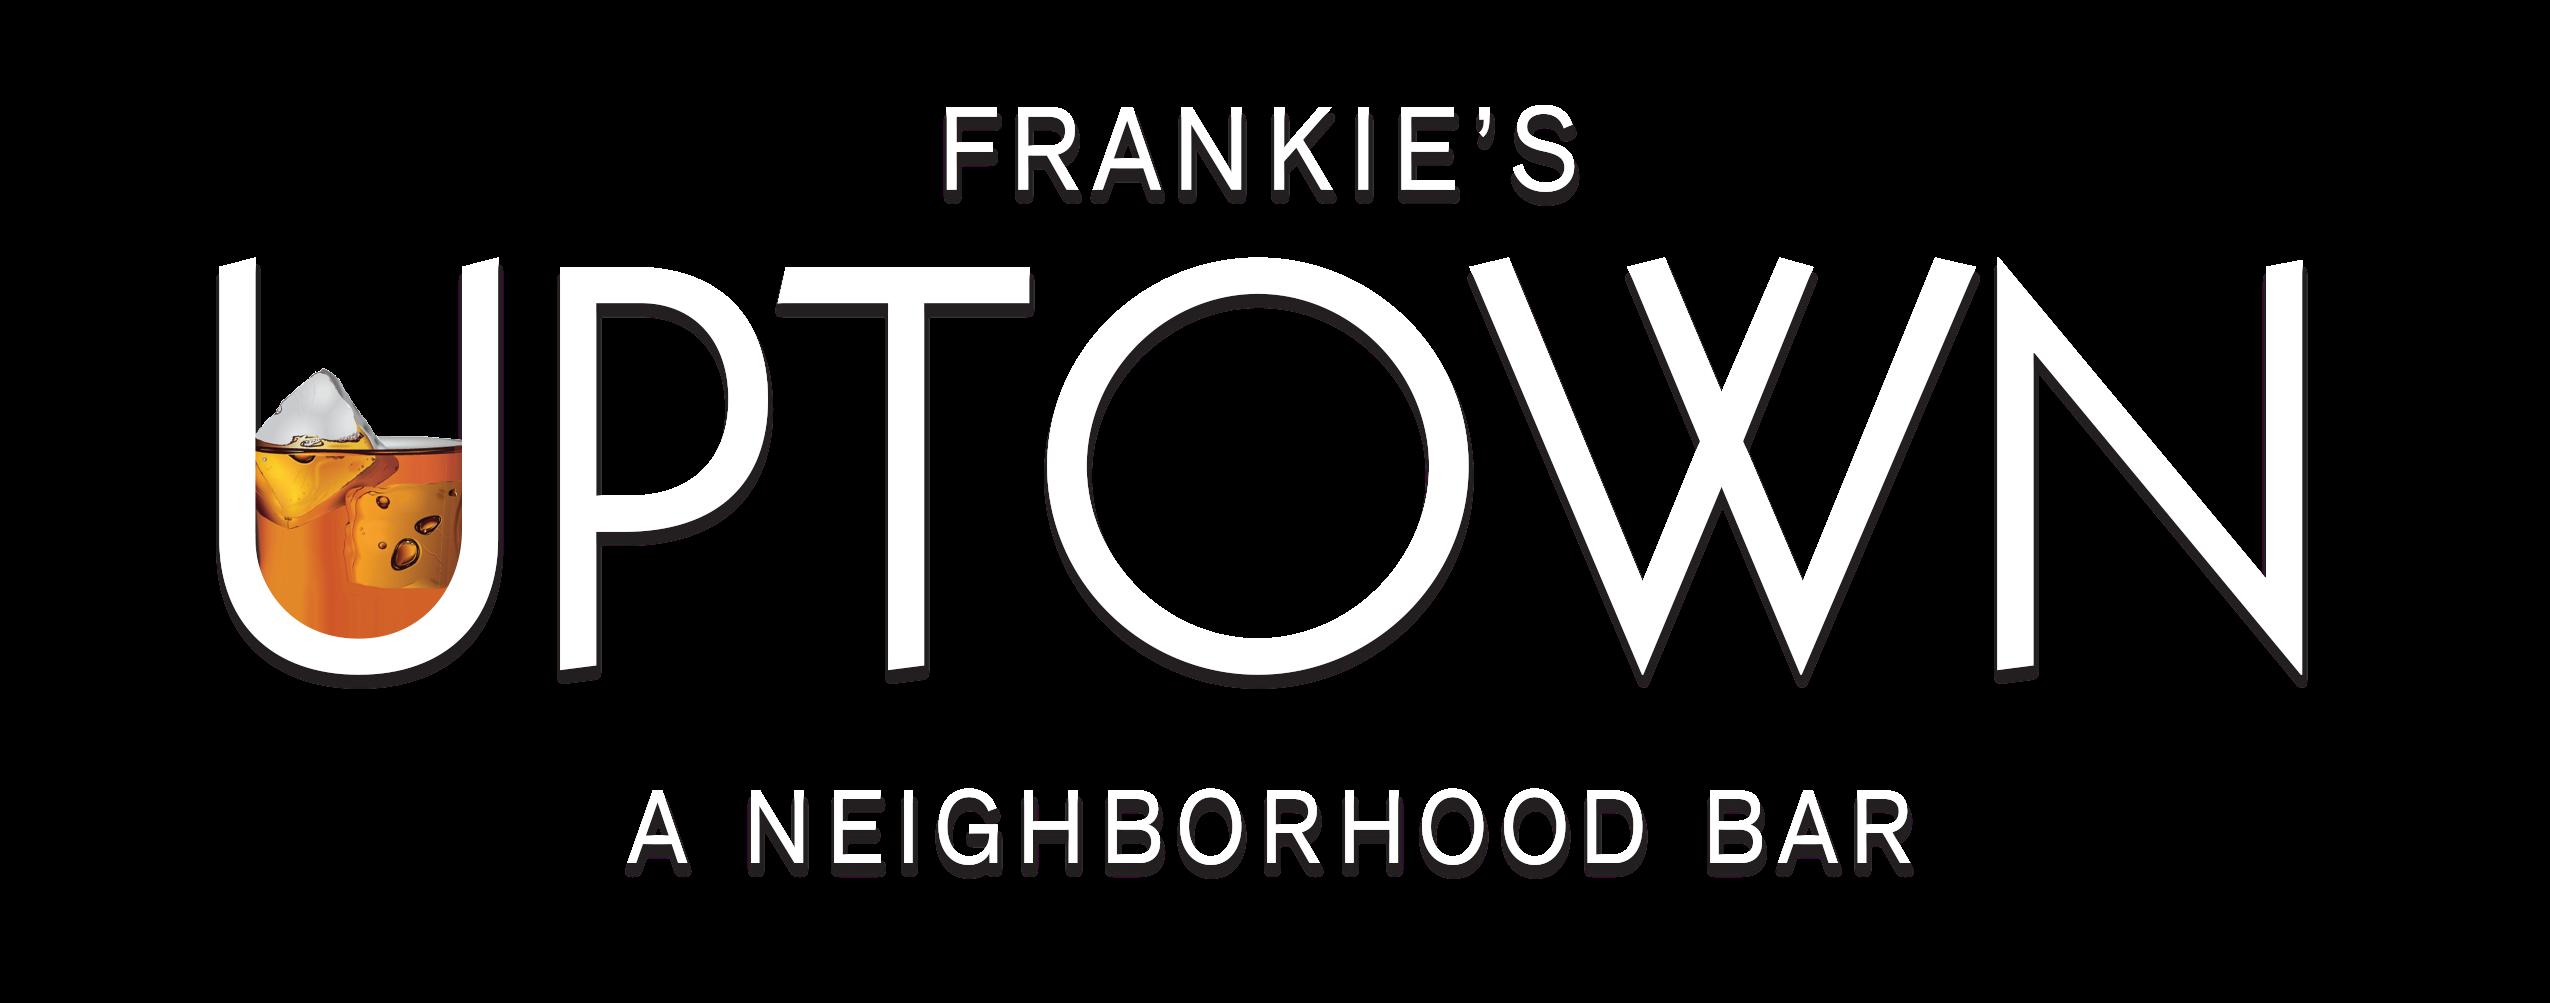 Frankies Uptown